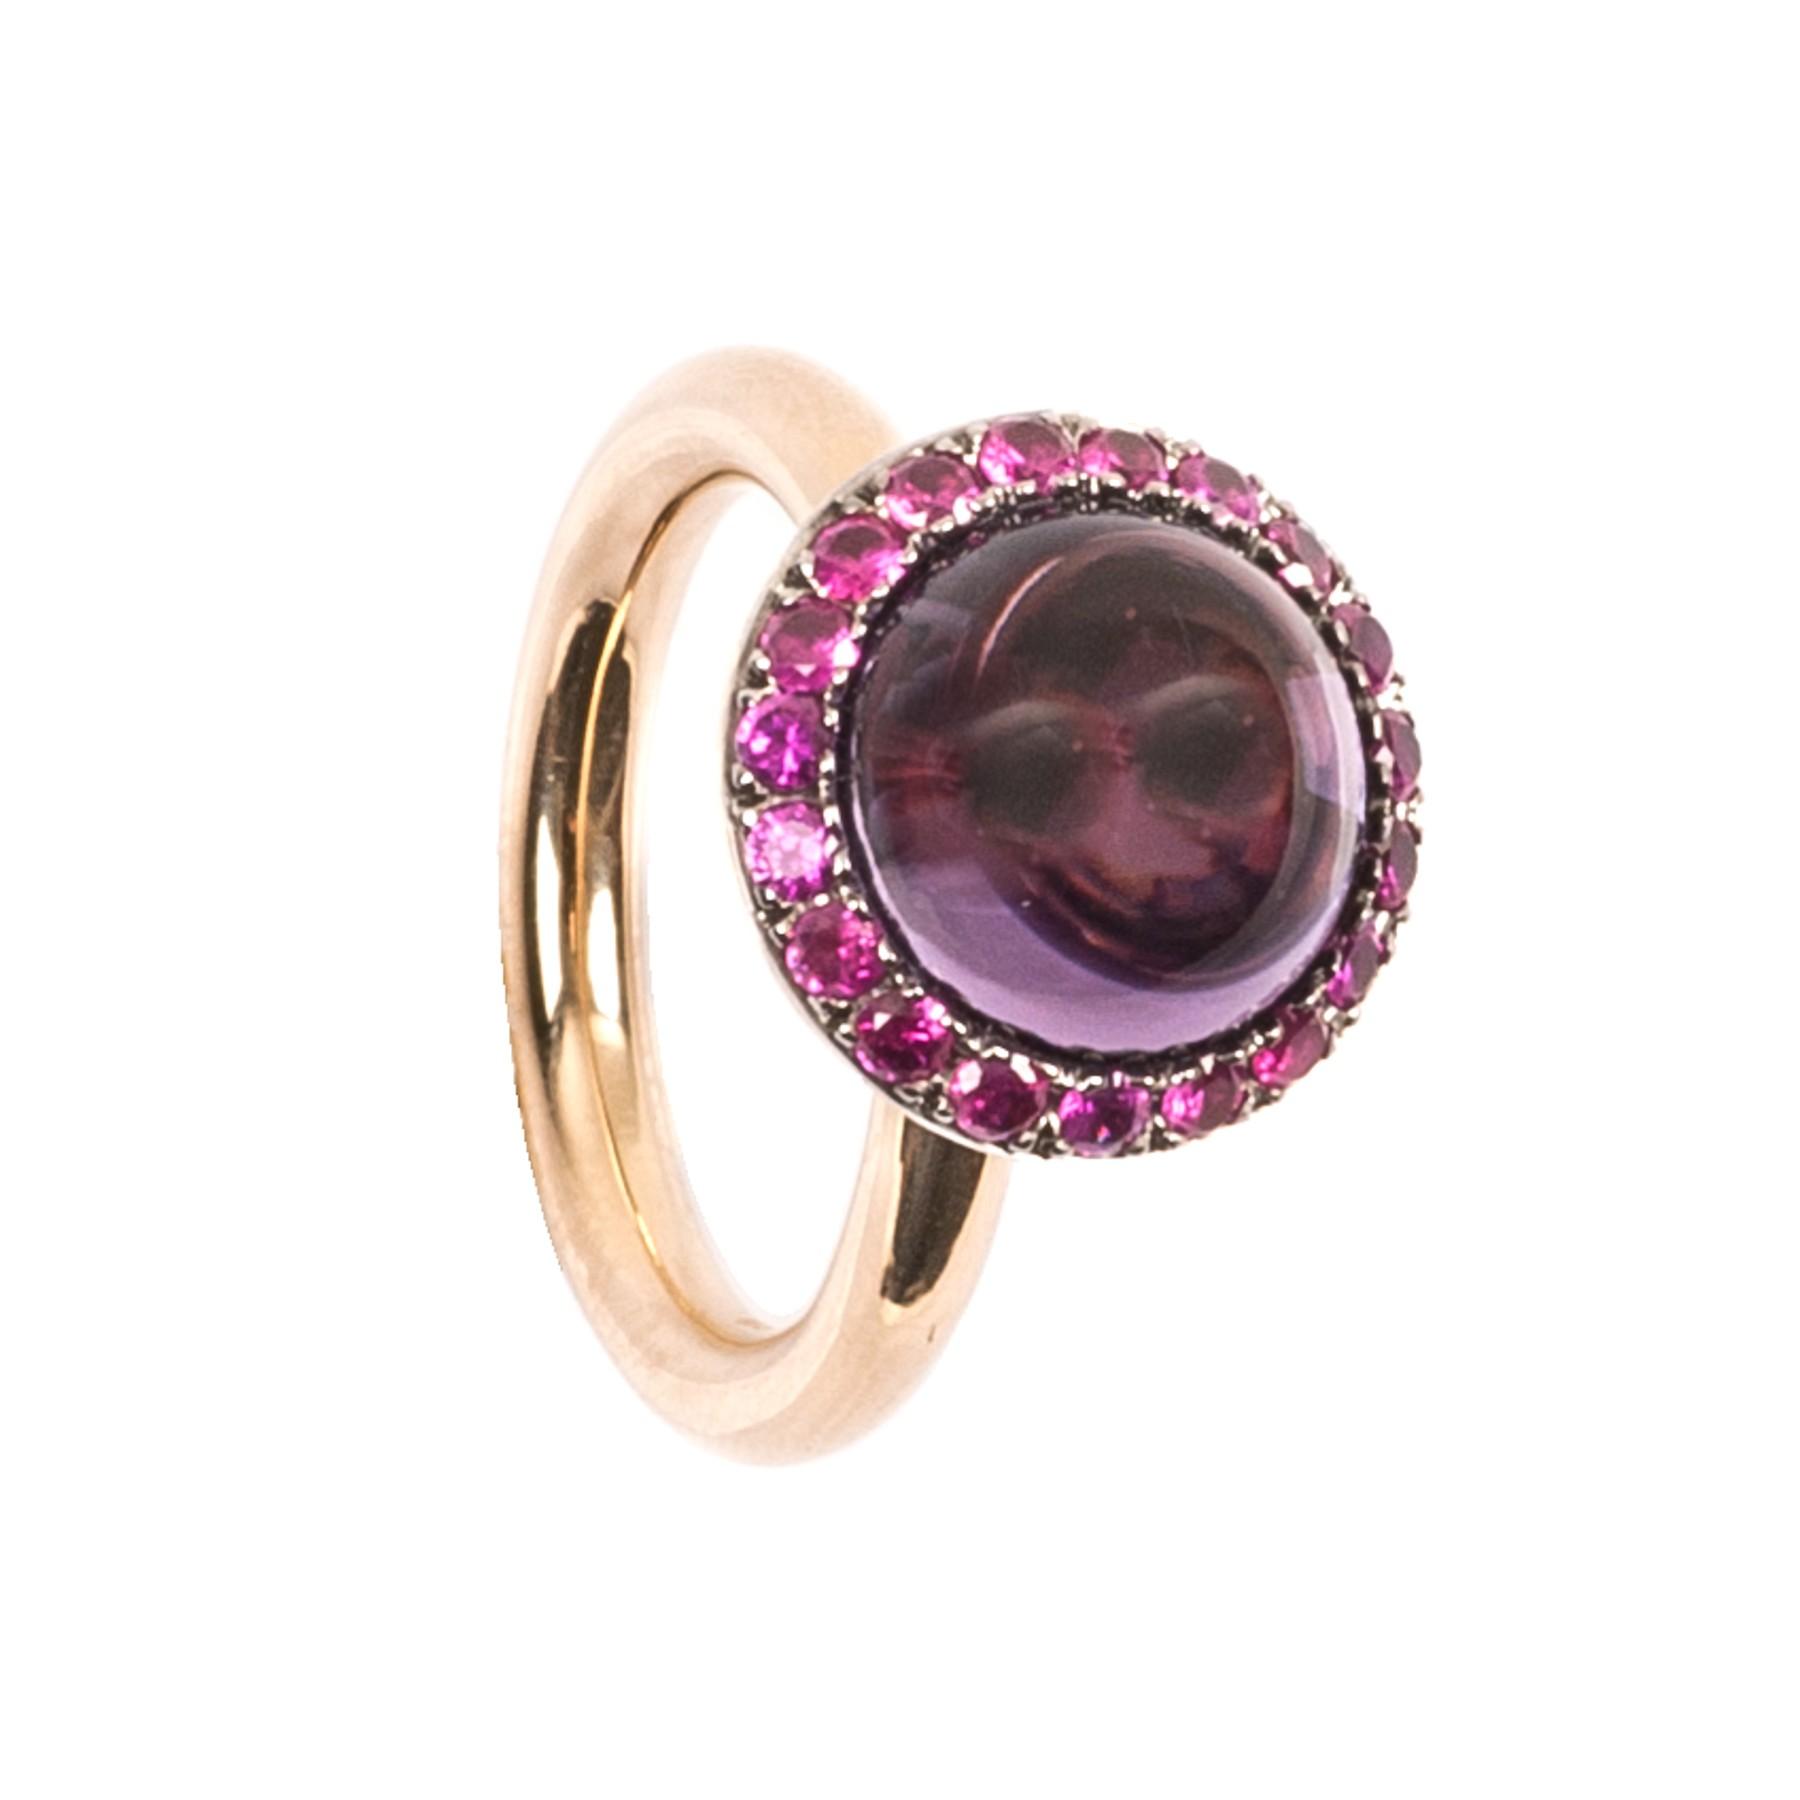 6,54CT Amethyst Ring